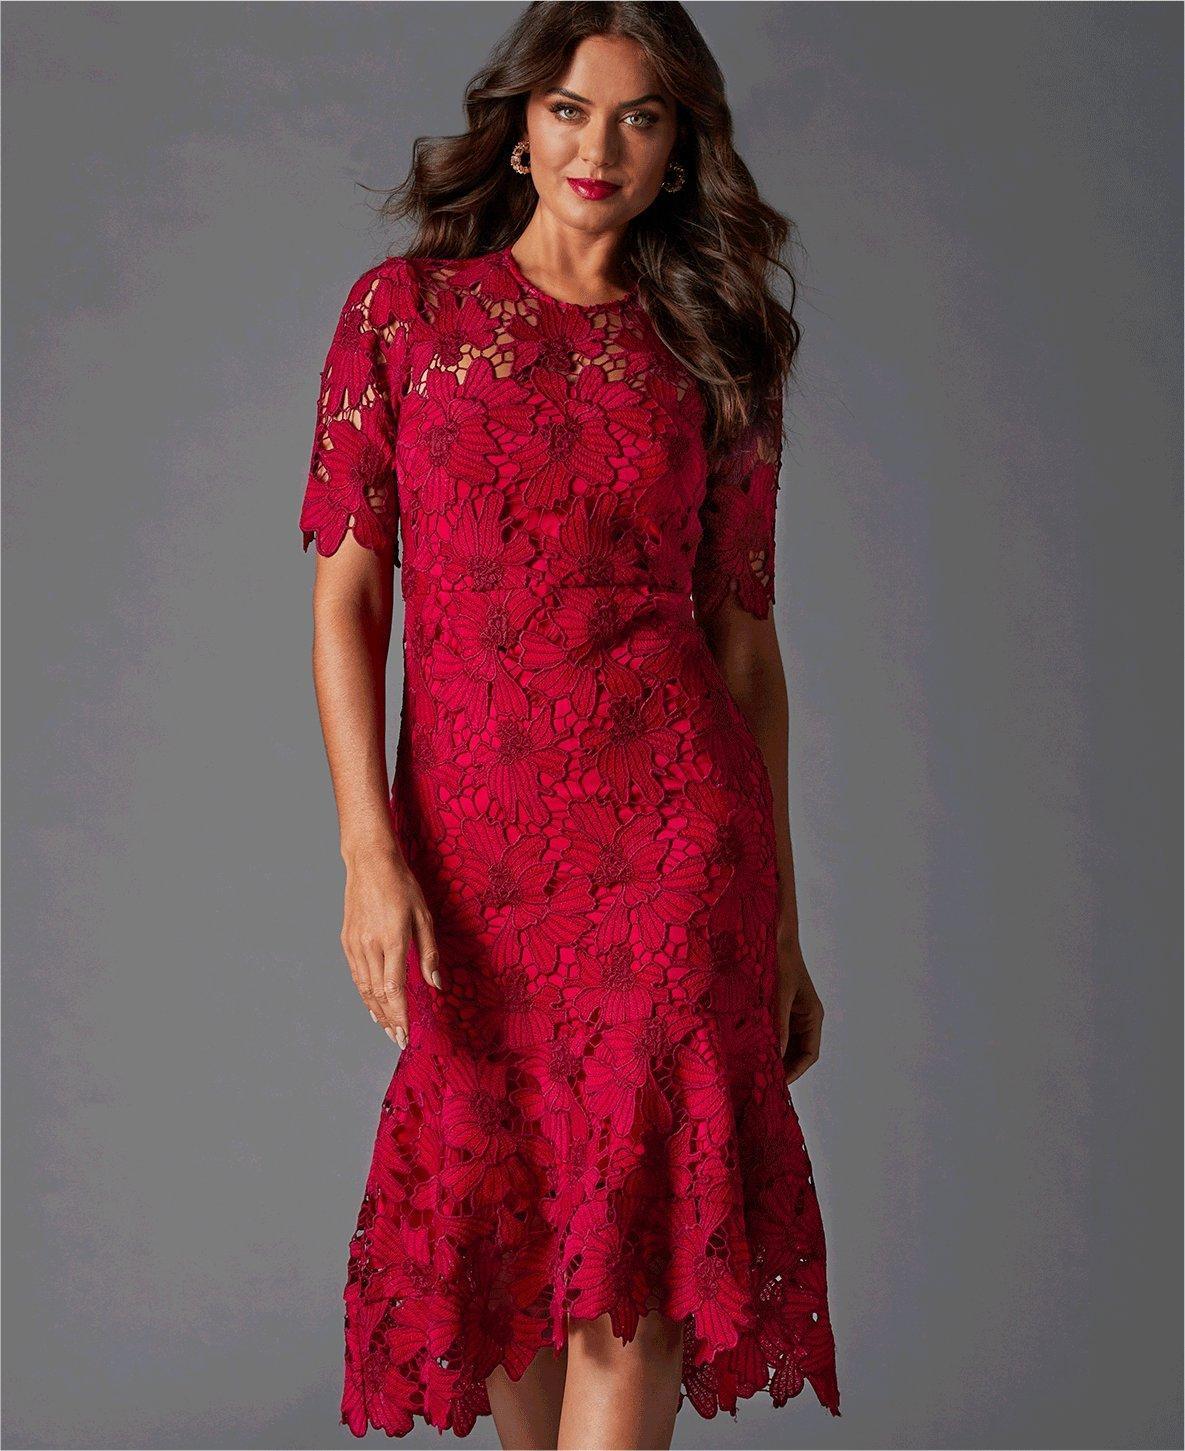 model wearing a red lace short sleeve sheath dress.